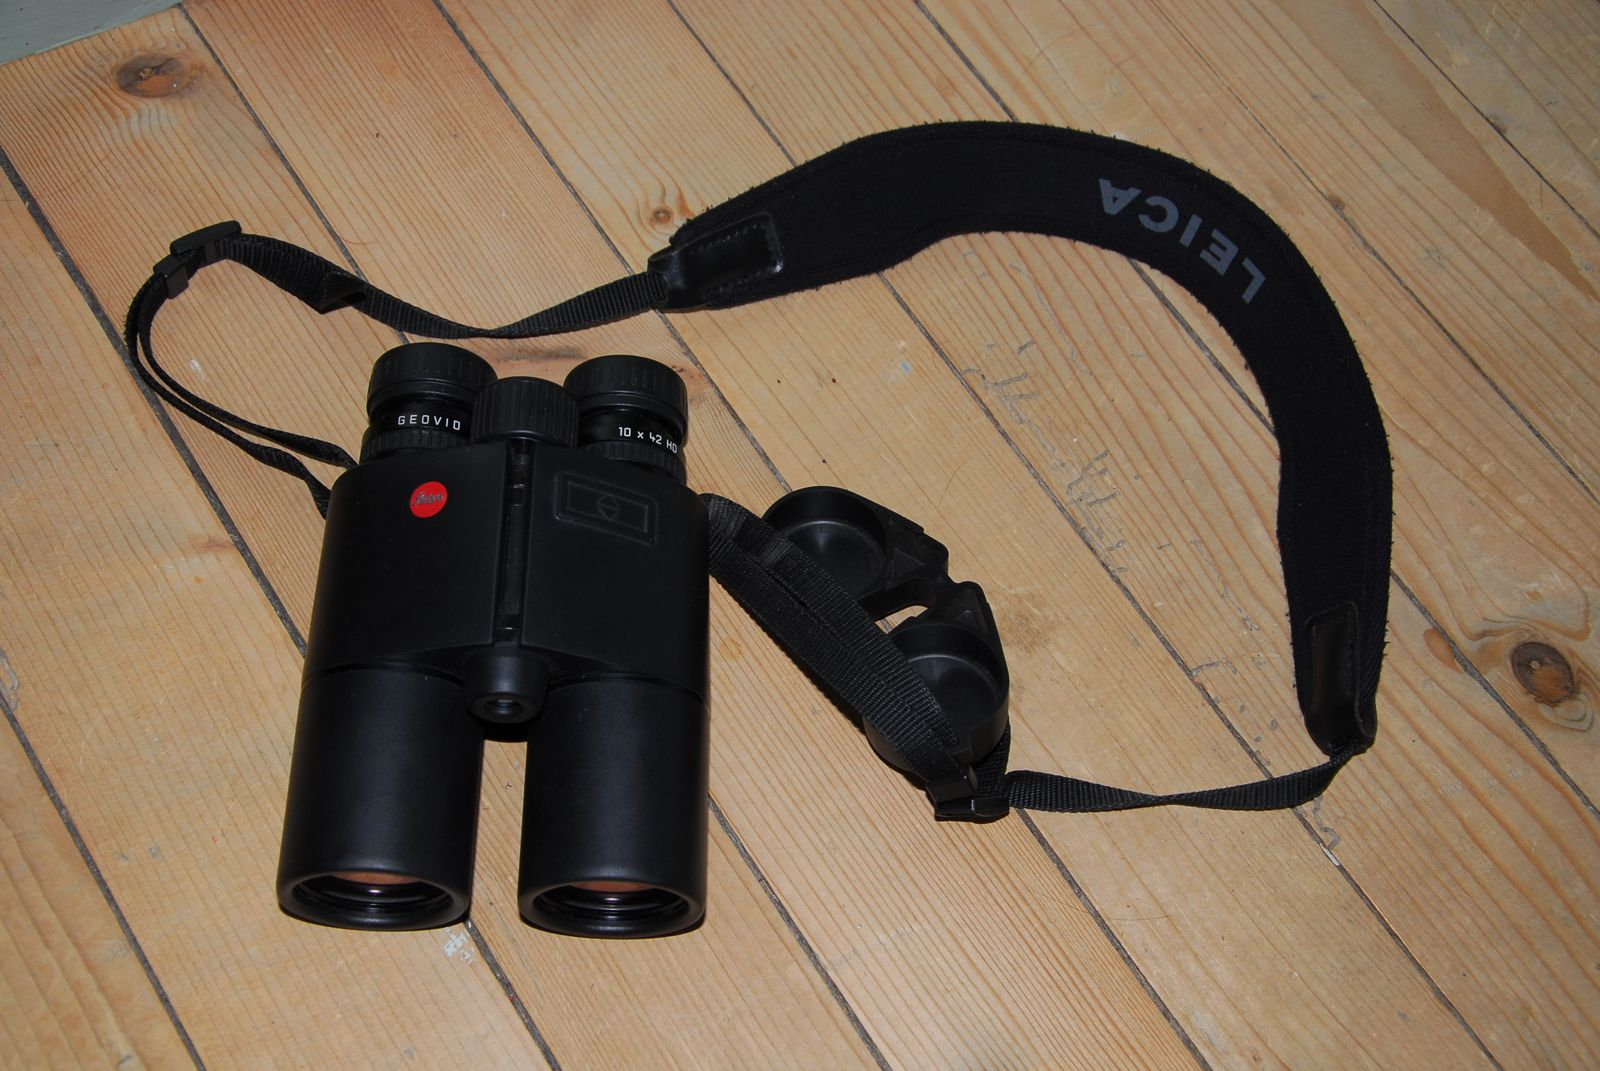 Entfernungsmesser Frankonia : Leica entfernungsmesser frankonia livingactive neuheiten